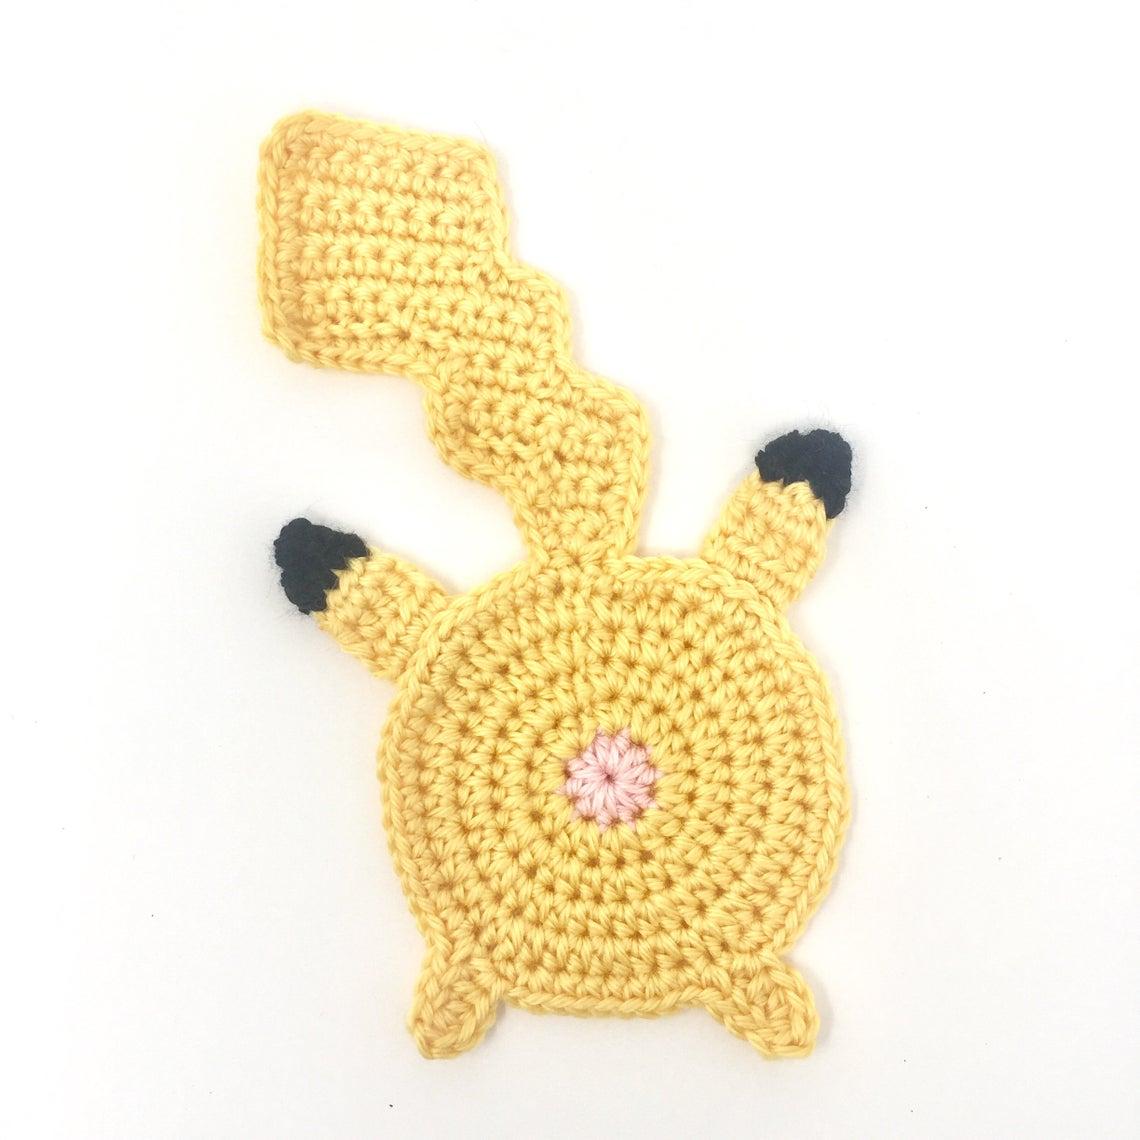 Pokemon Butt Coasters Crochet Patterns